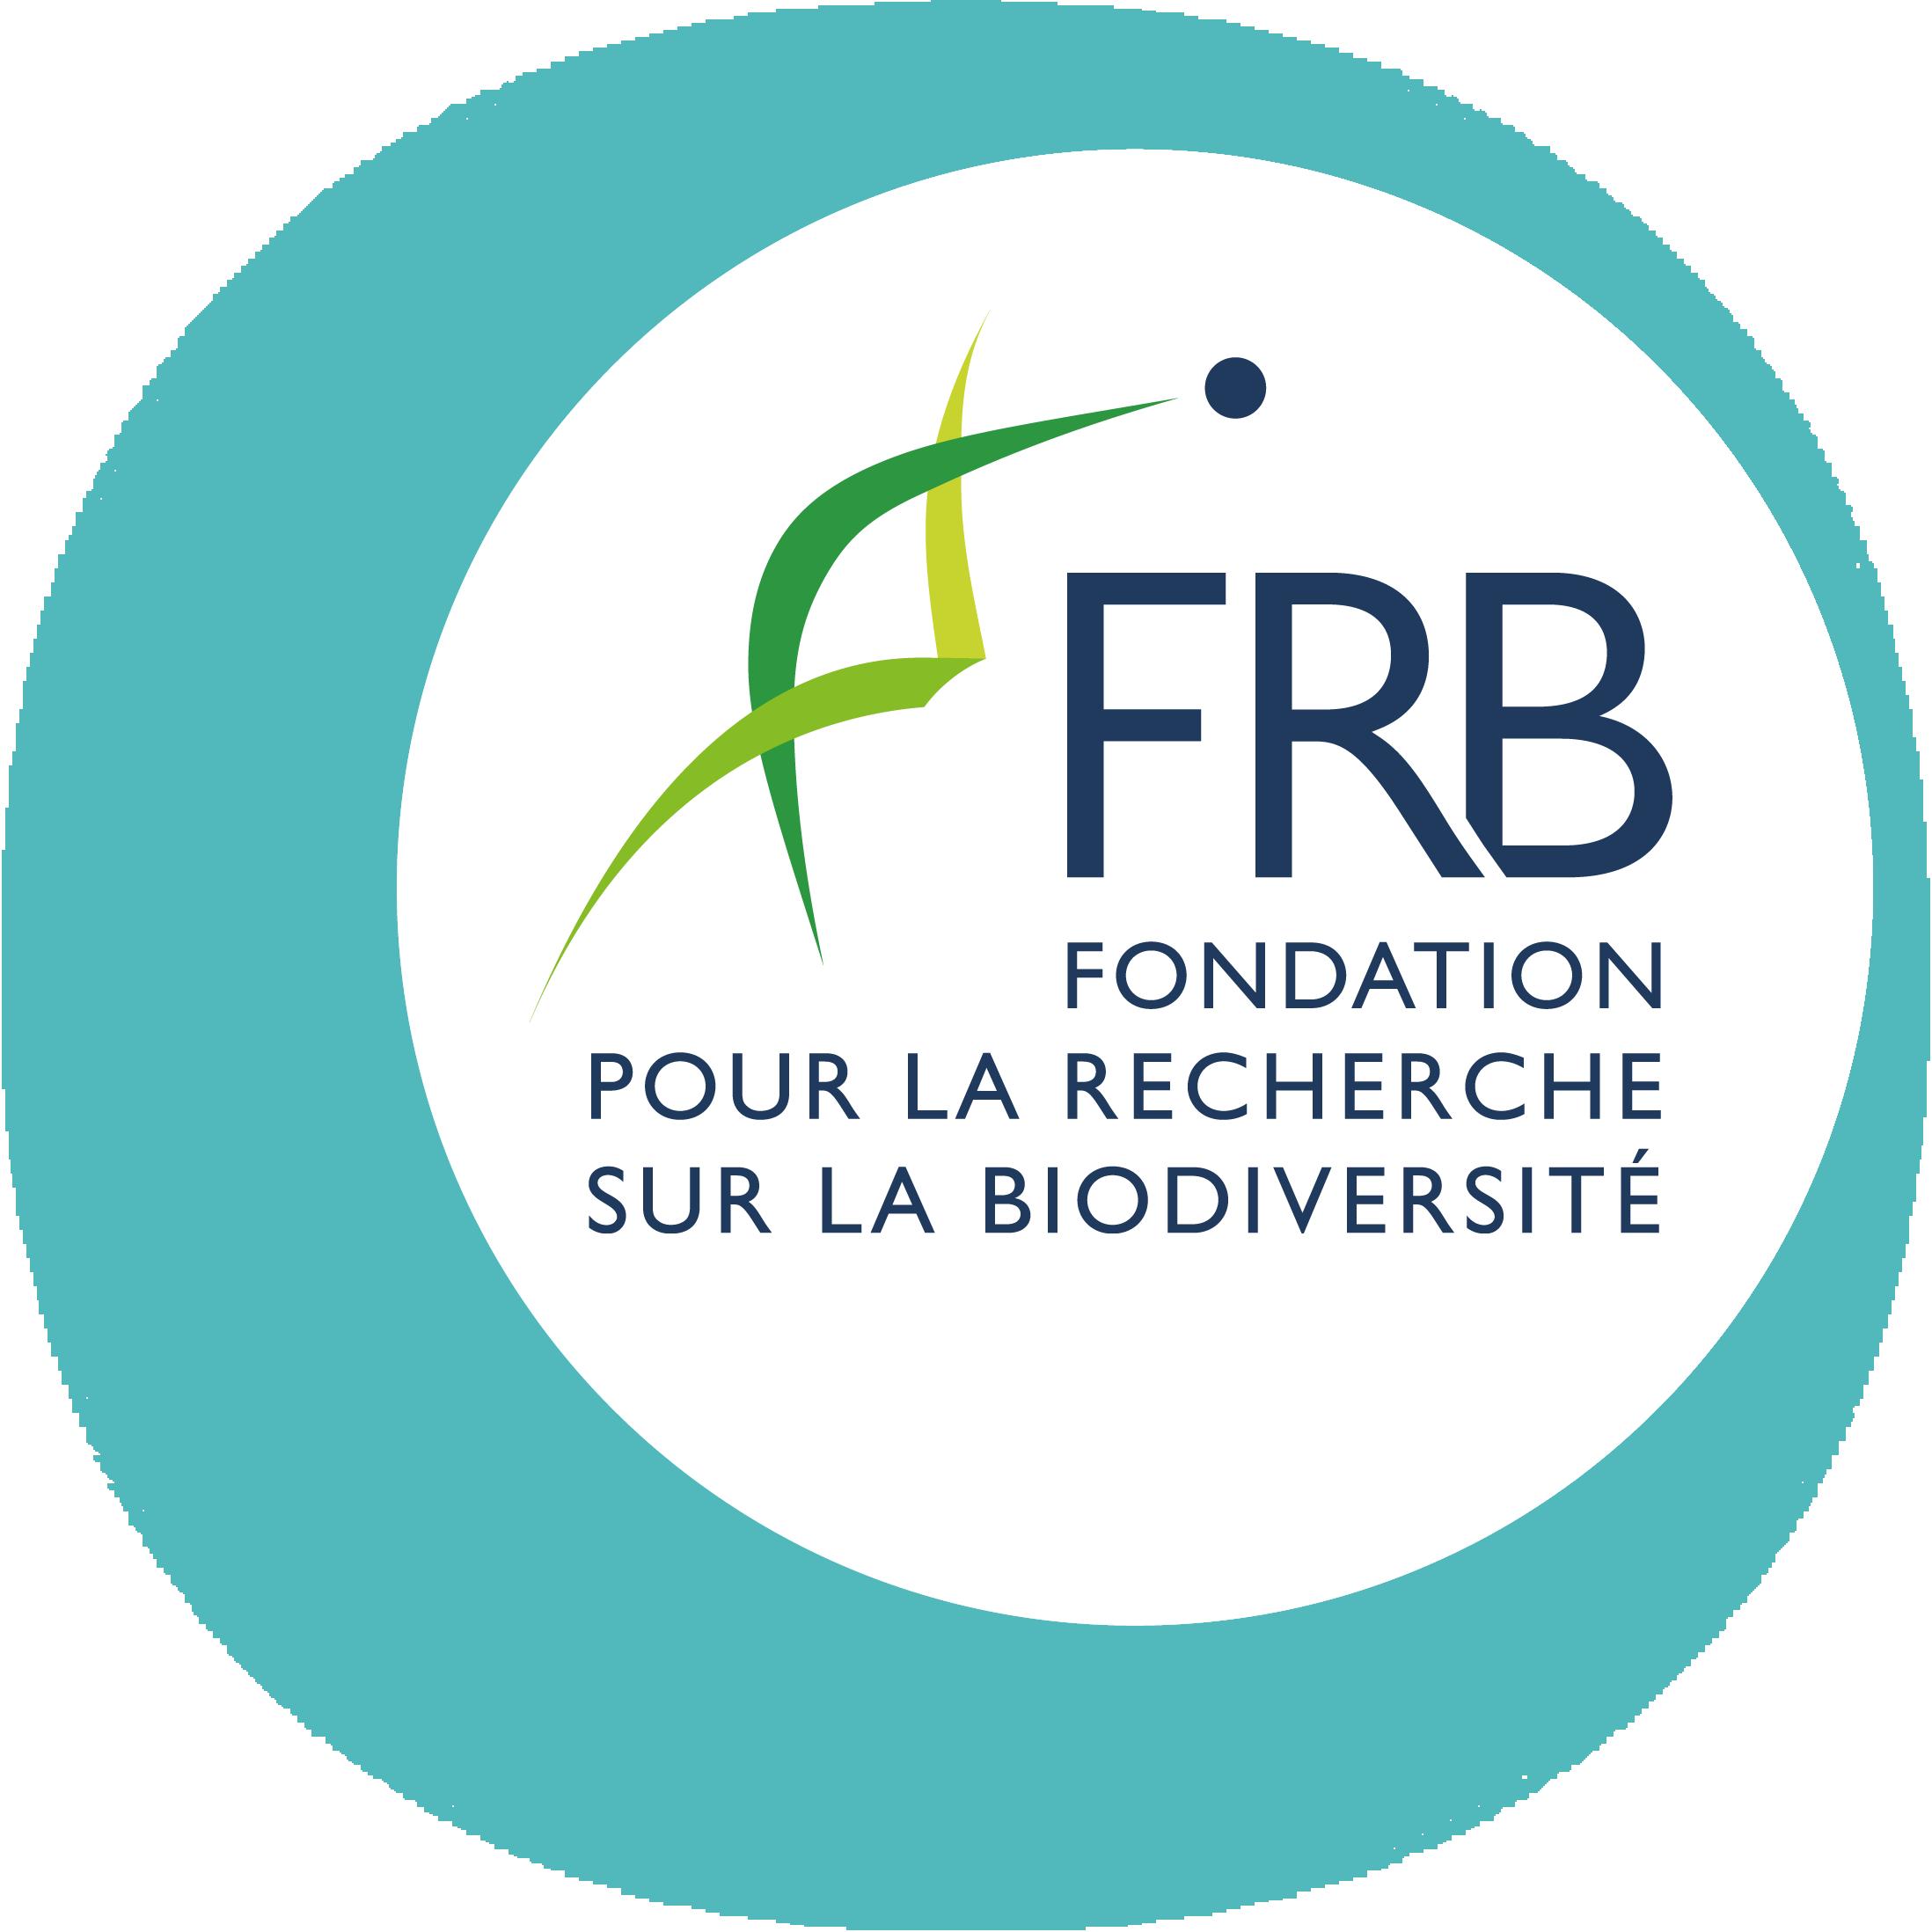 logo_FRB_RVBweb_1.png